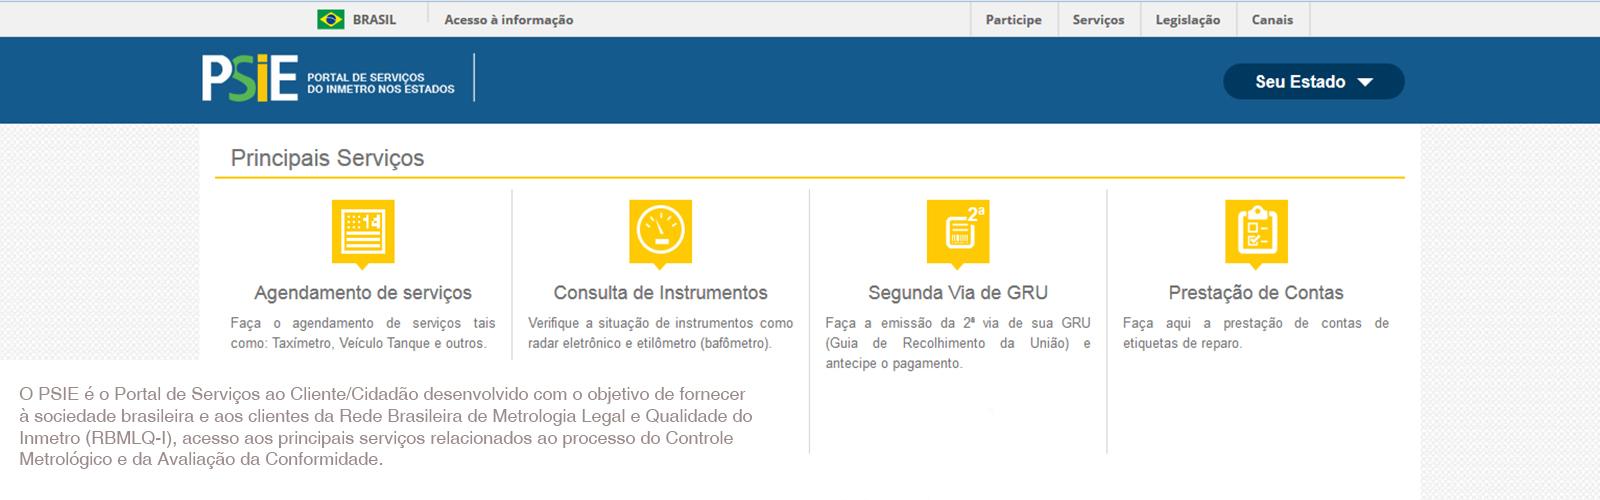 PSIE - Portal de Serviços do Inmetro nos Estados